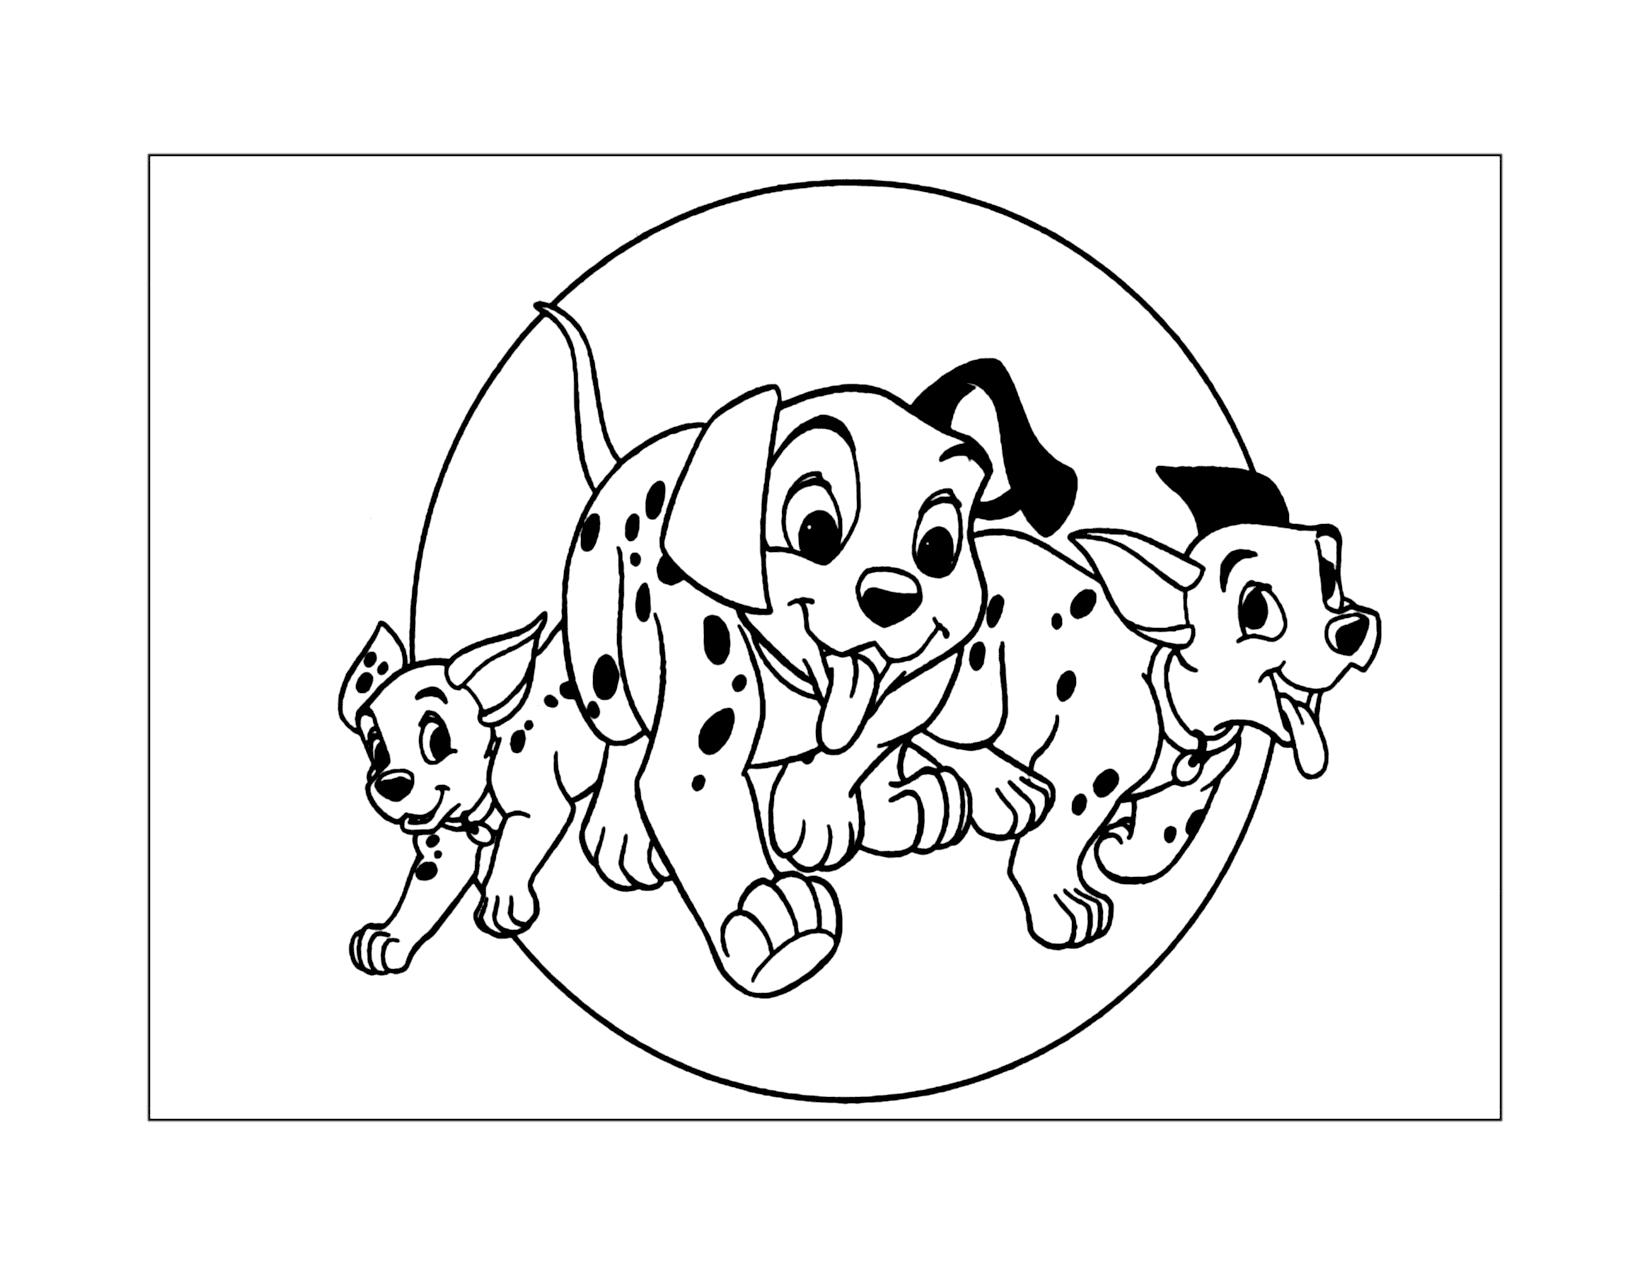 101 Dalmatians Printable Coloring Pages